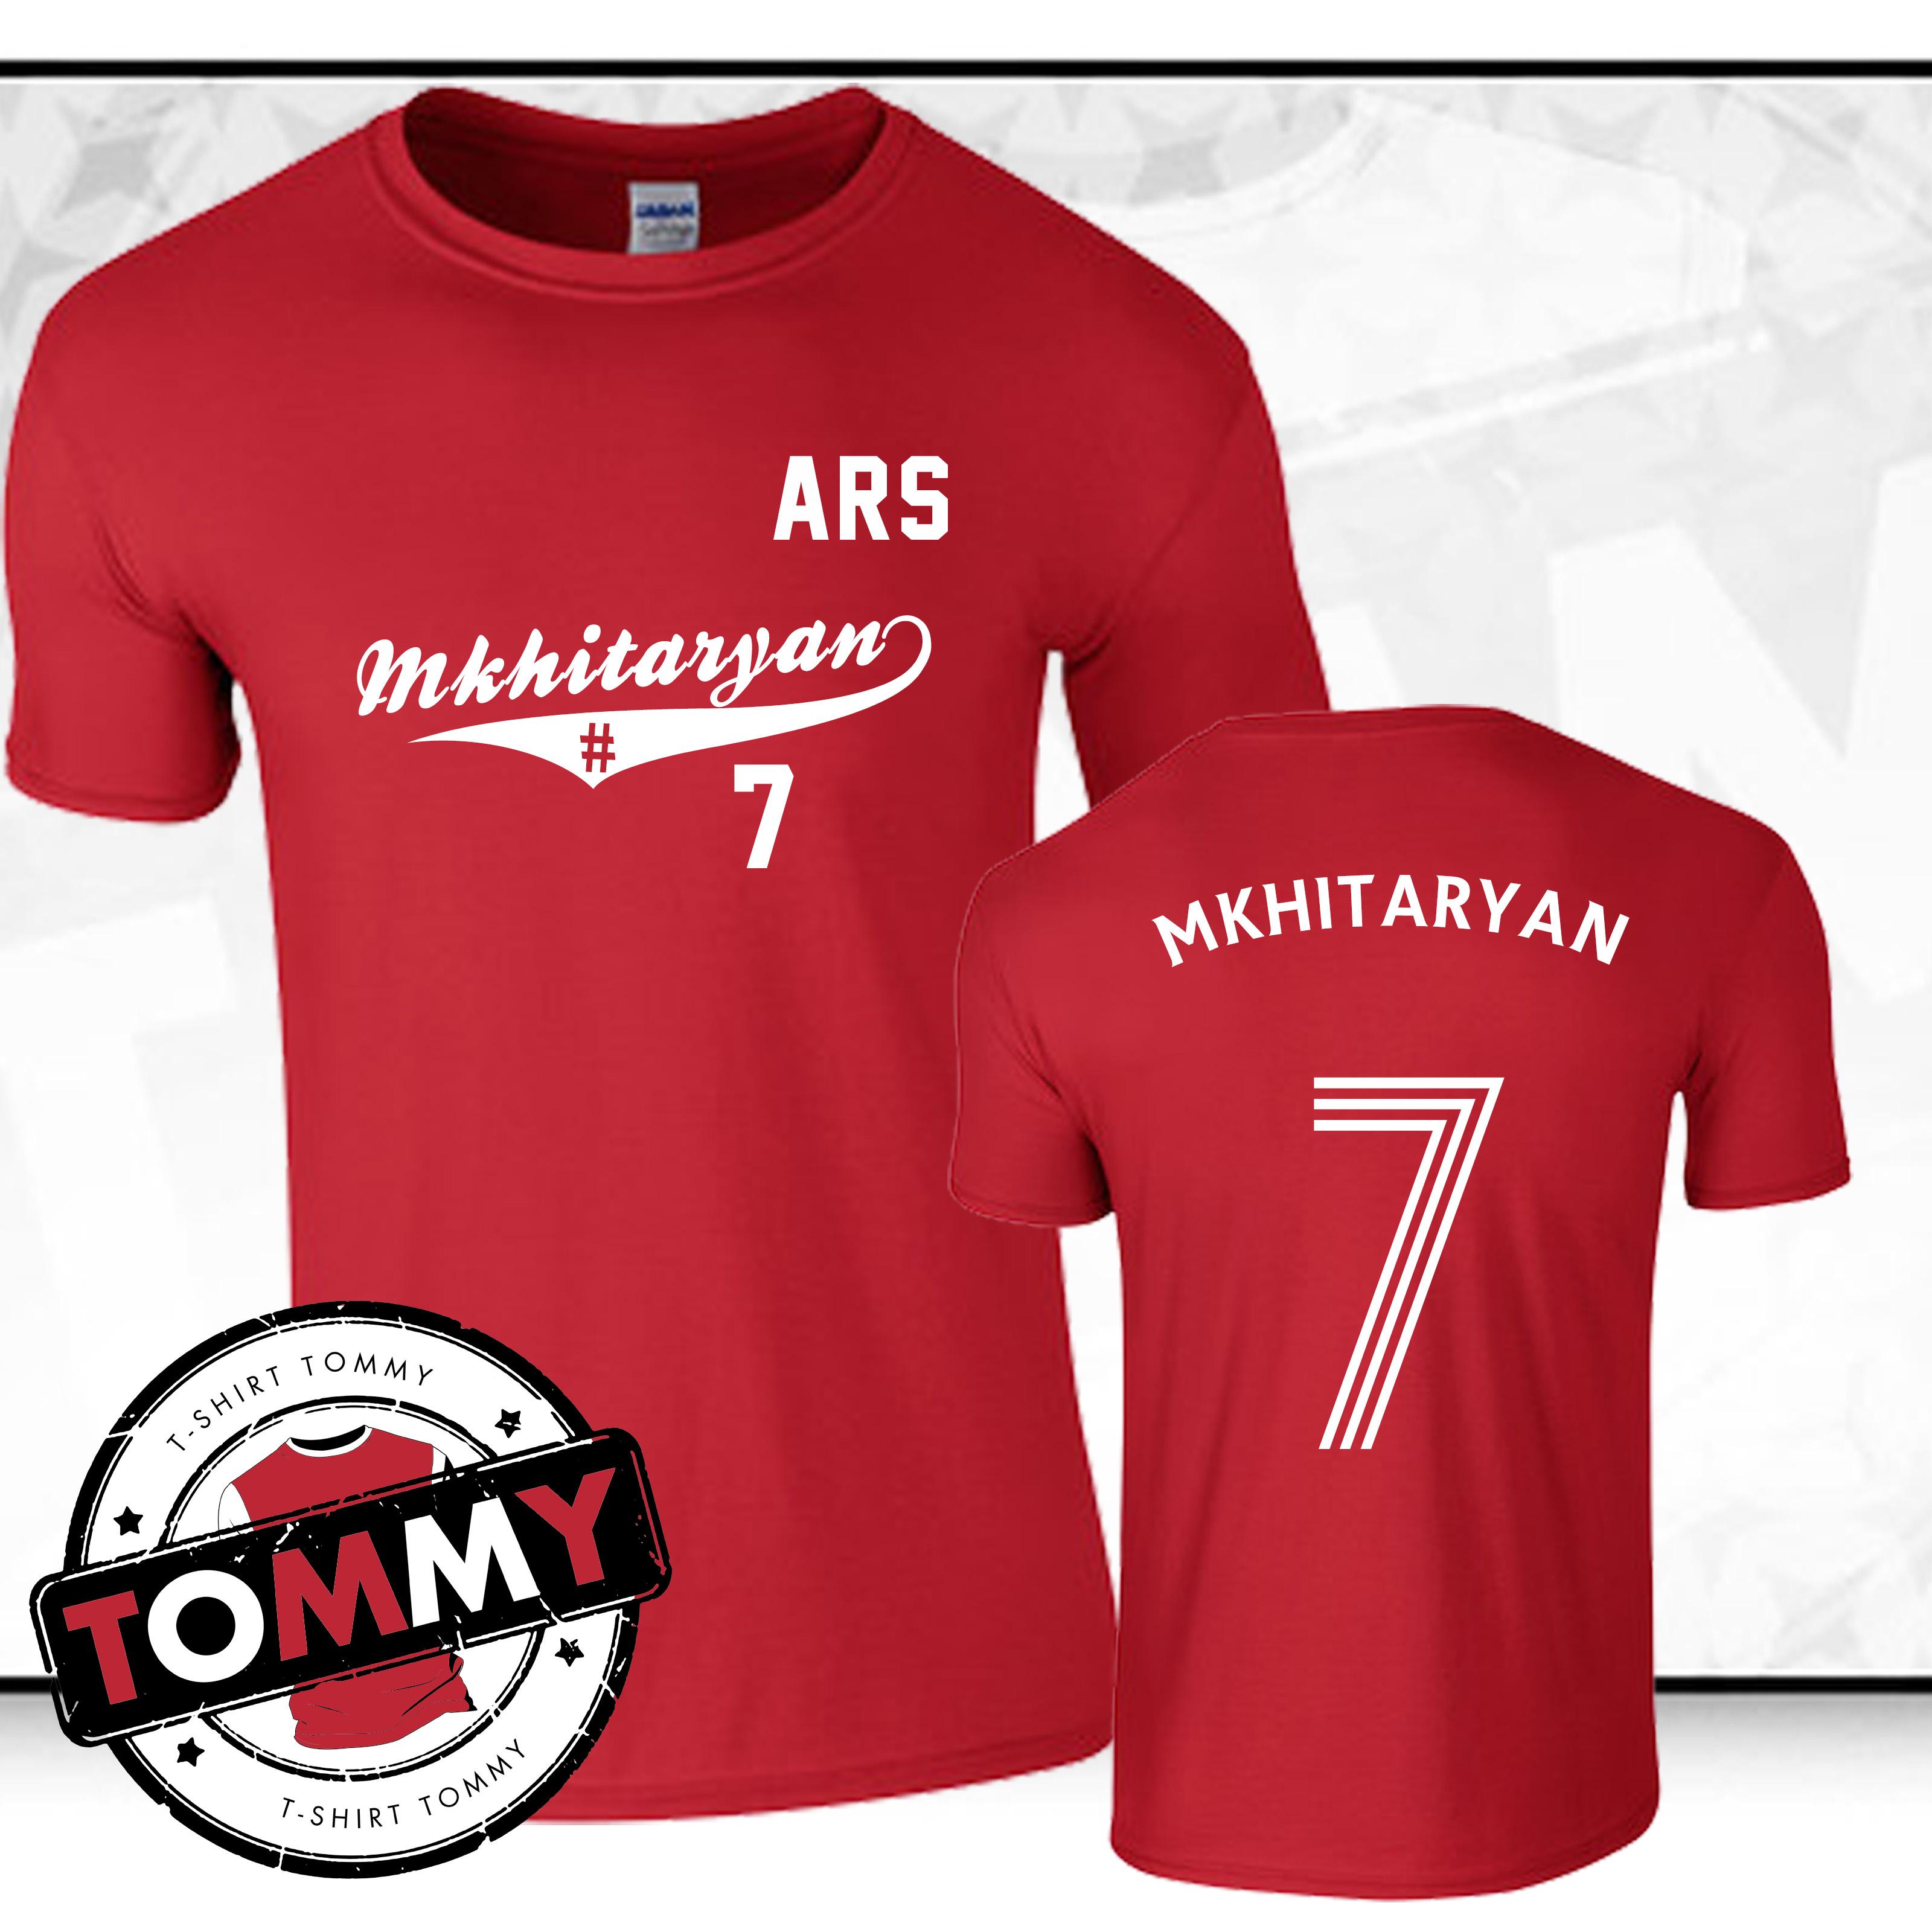 buy popular 9860f 5b384 Details about Henrikh MKH Henrikh Mkhitaryan #7 Arsenal FC T-Shirt, tshirt,  Arsenal tshirt